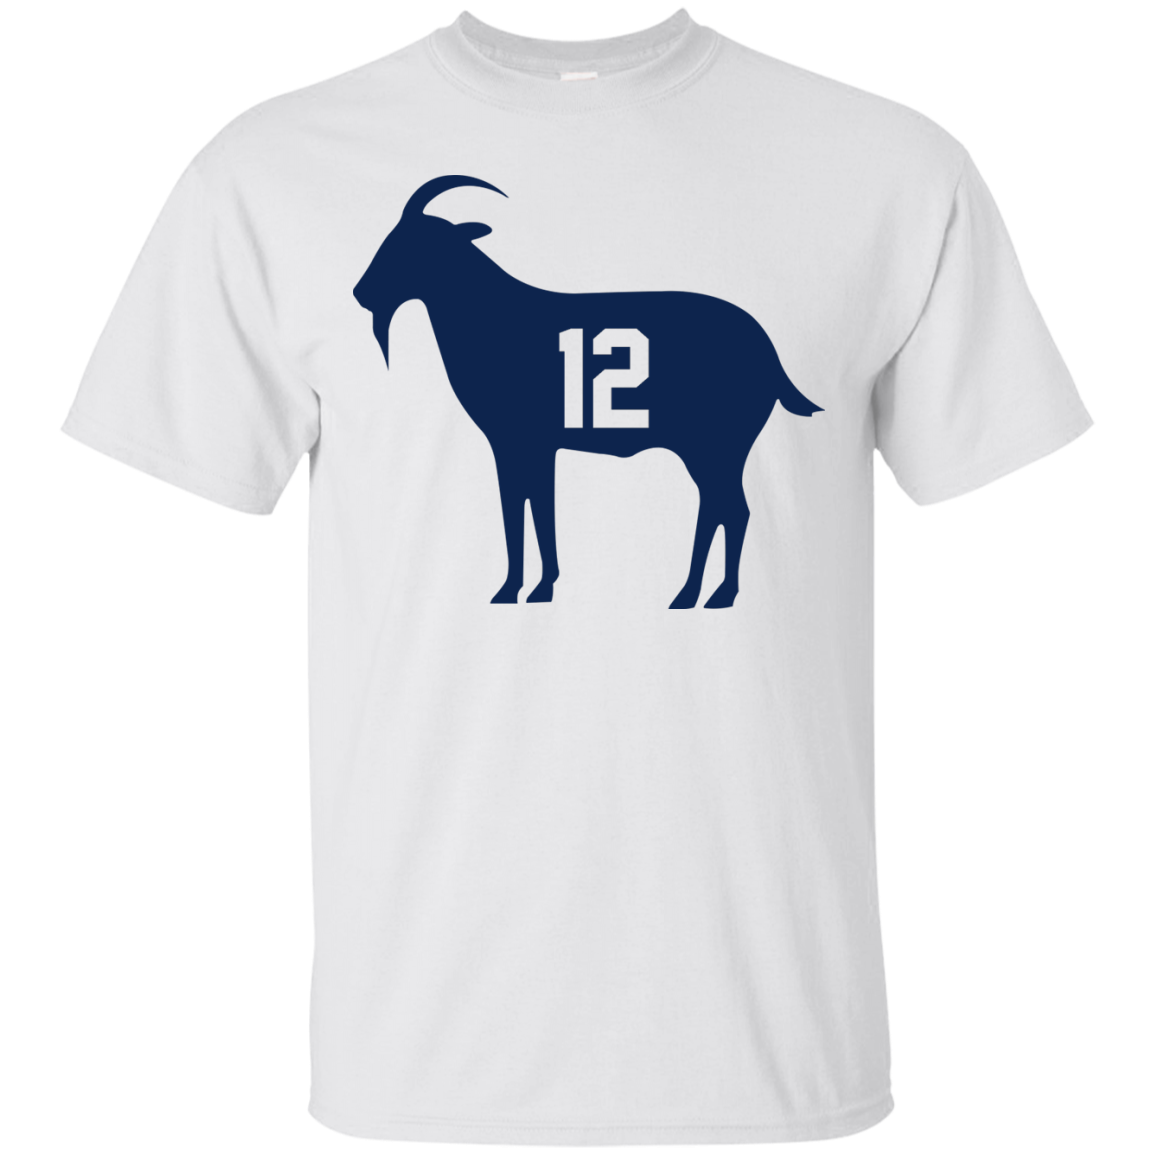 image 74px Goat Tb 12 Tom Brady T Shirt, Hoodies, Tank Top